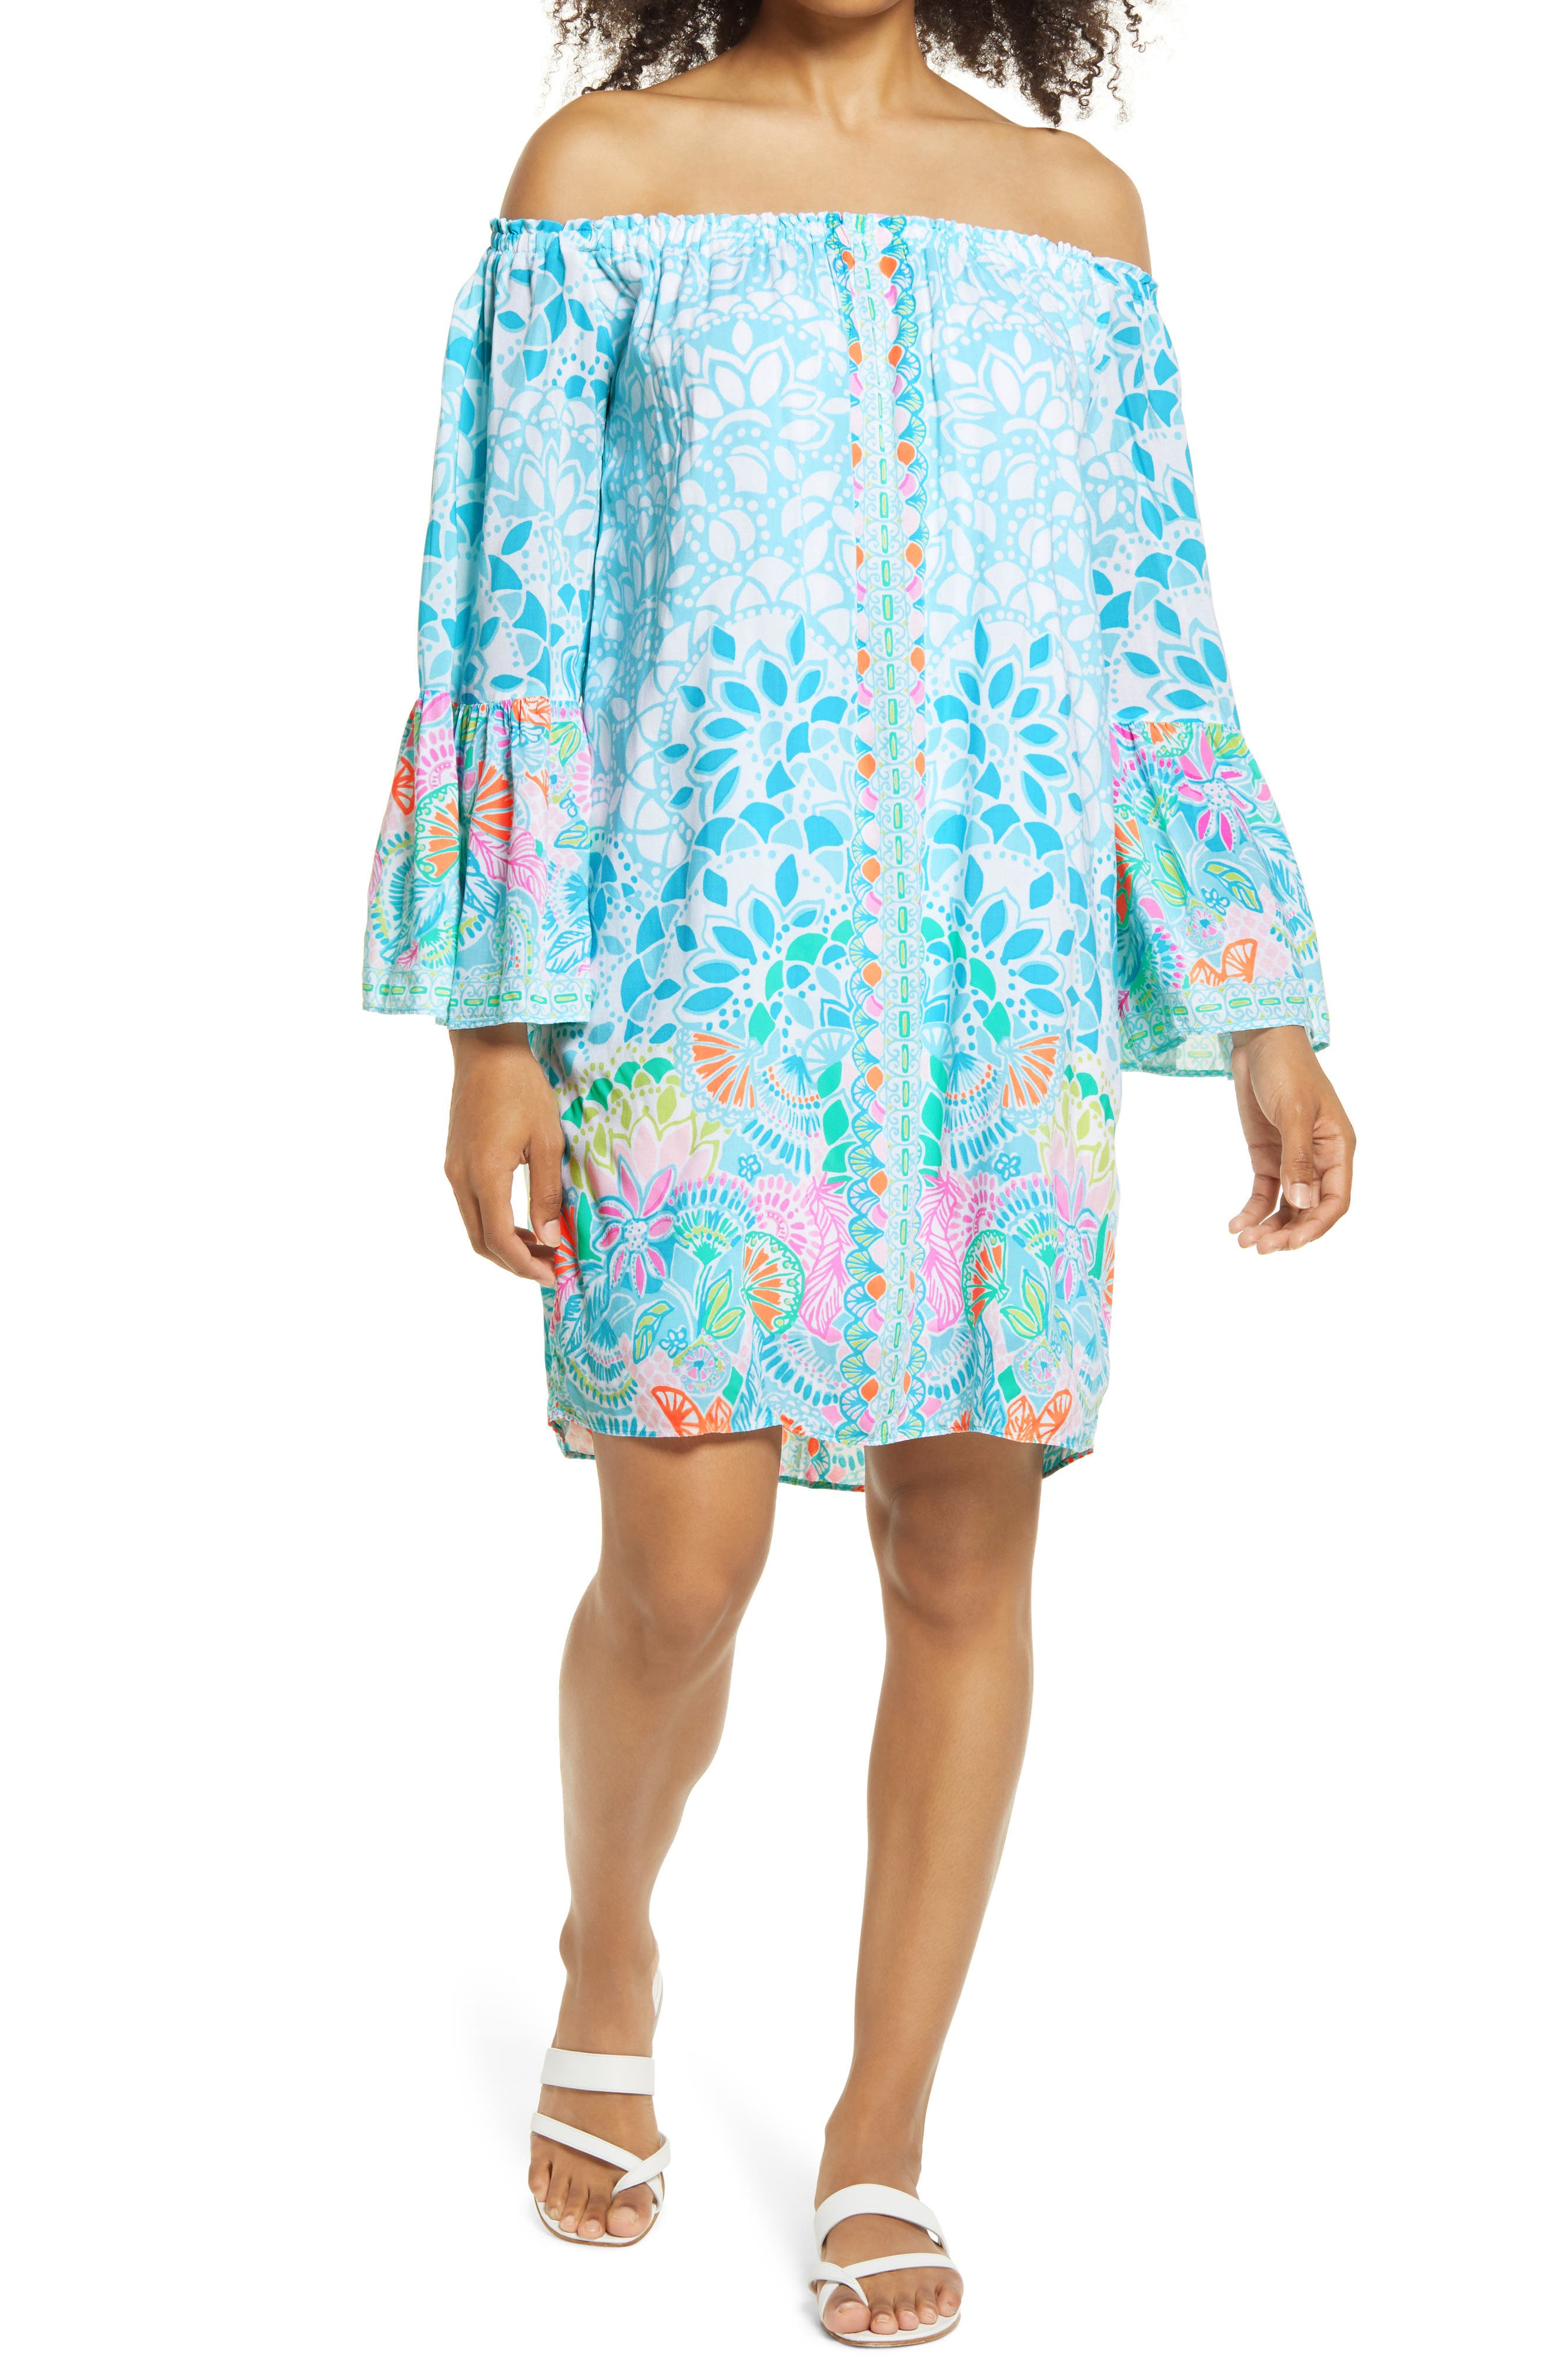 Women's Lilly Pullitzer Nevie Off The Shoulder Dress